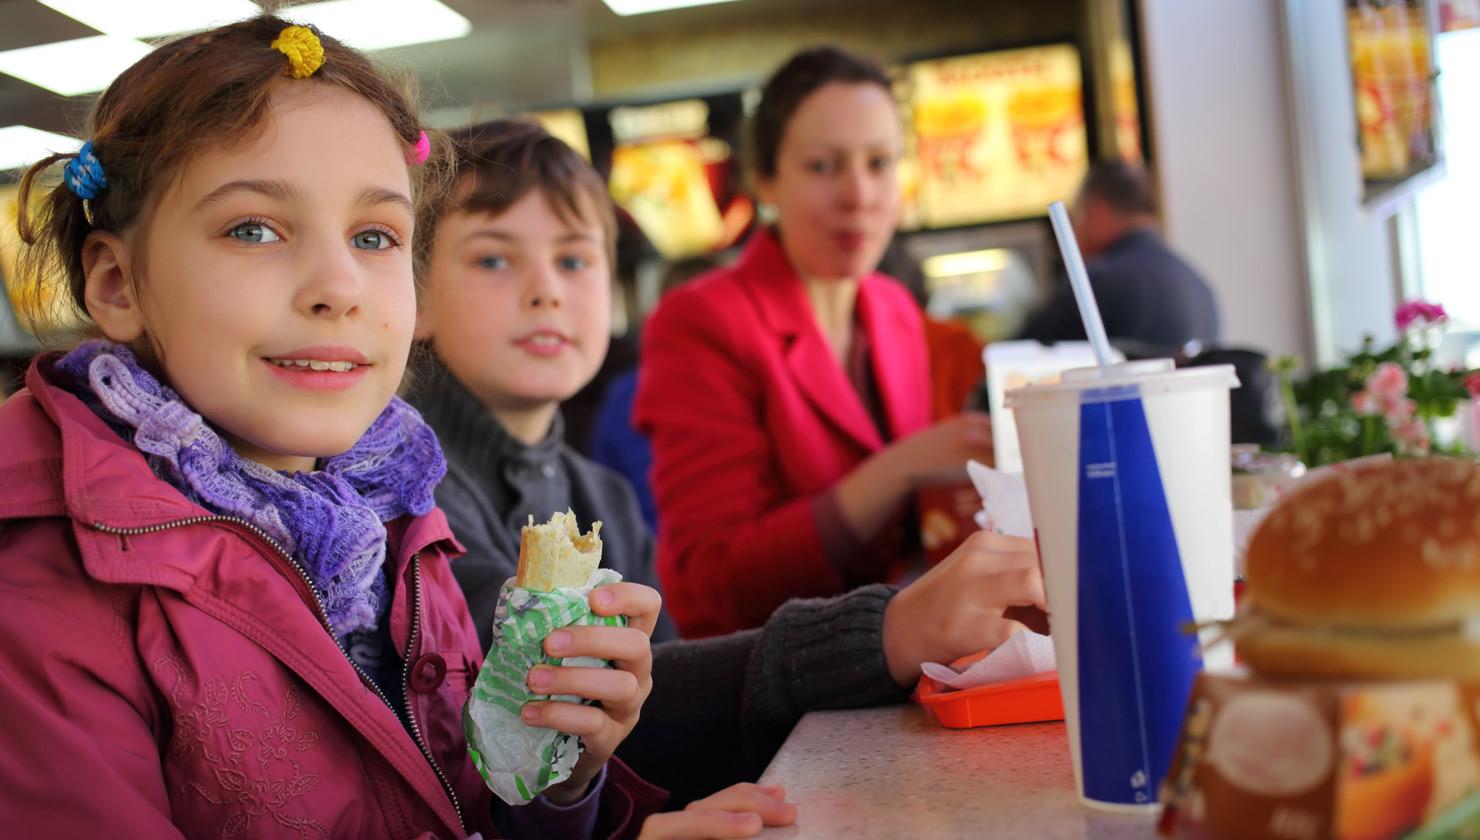 Image of kids-meals-shutterstock_210710152